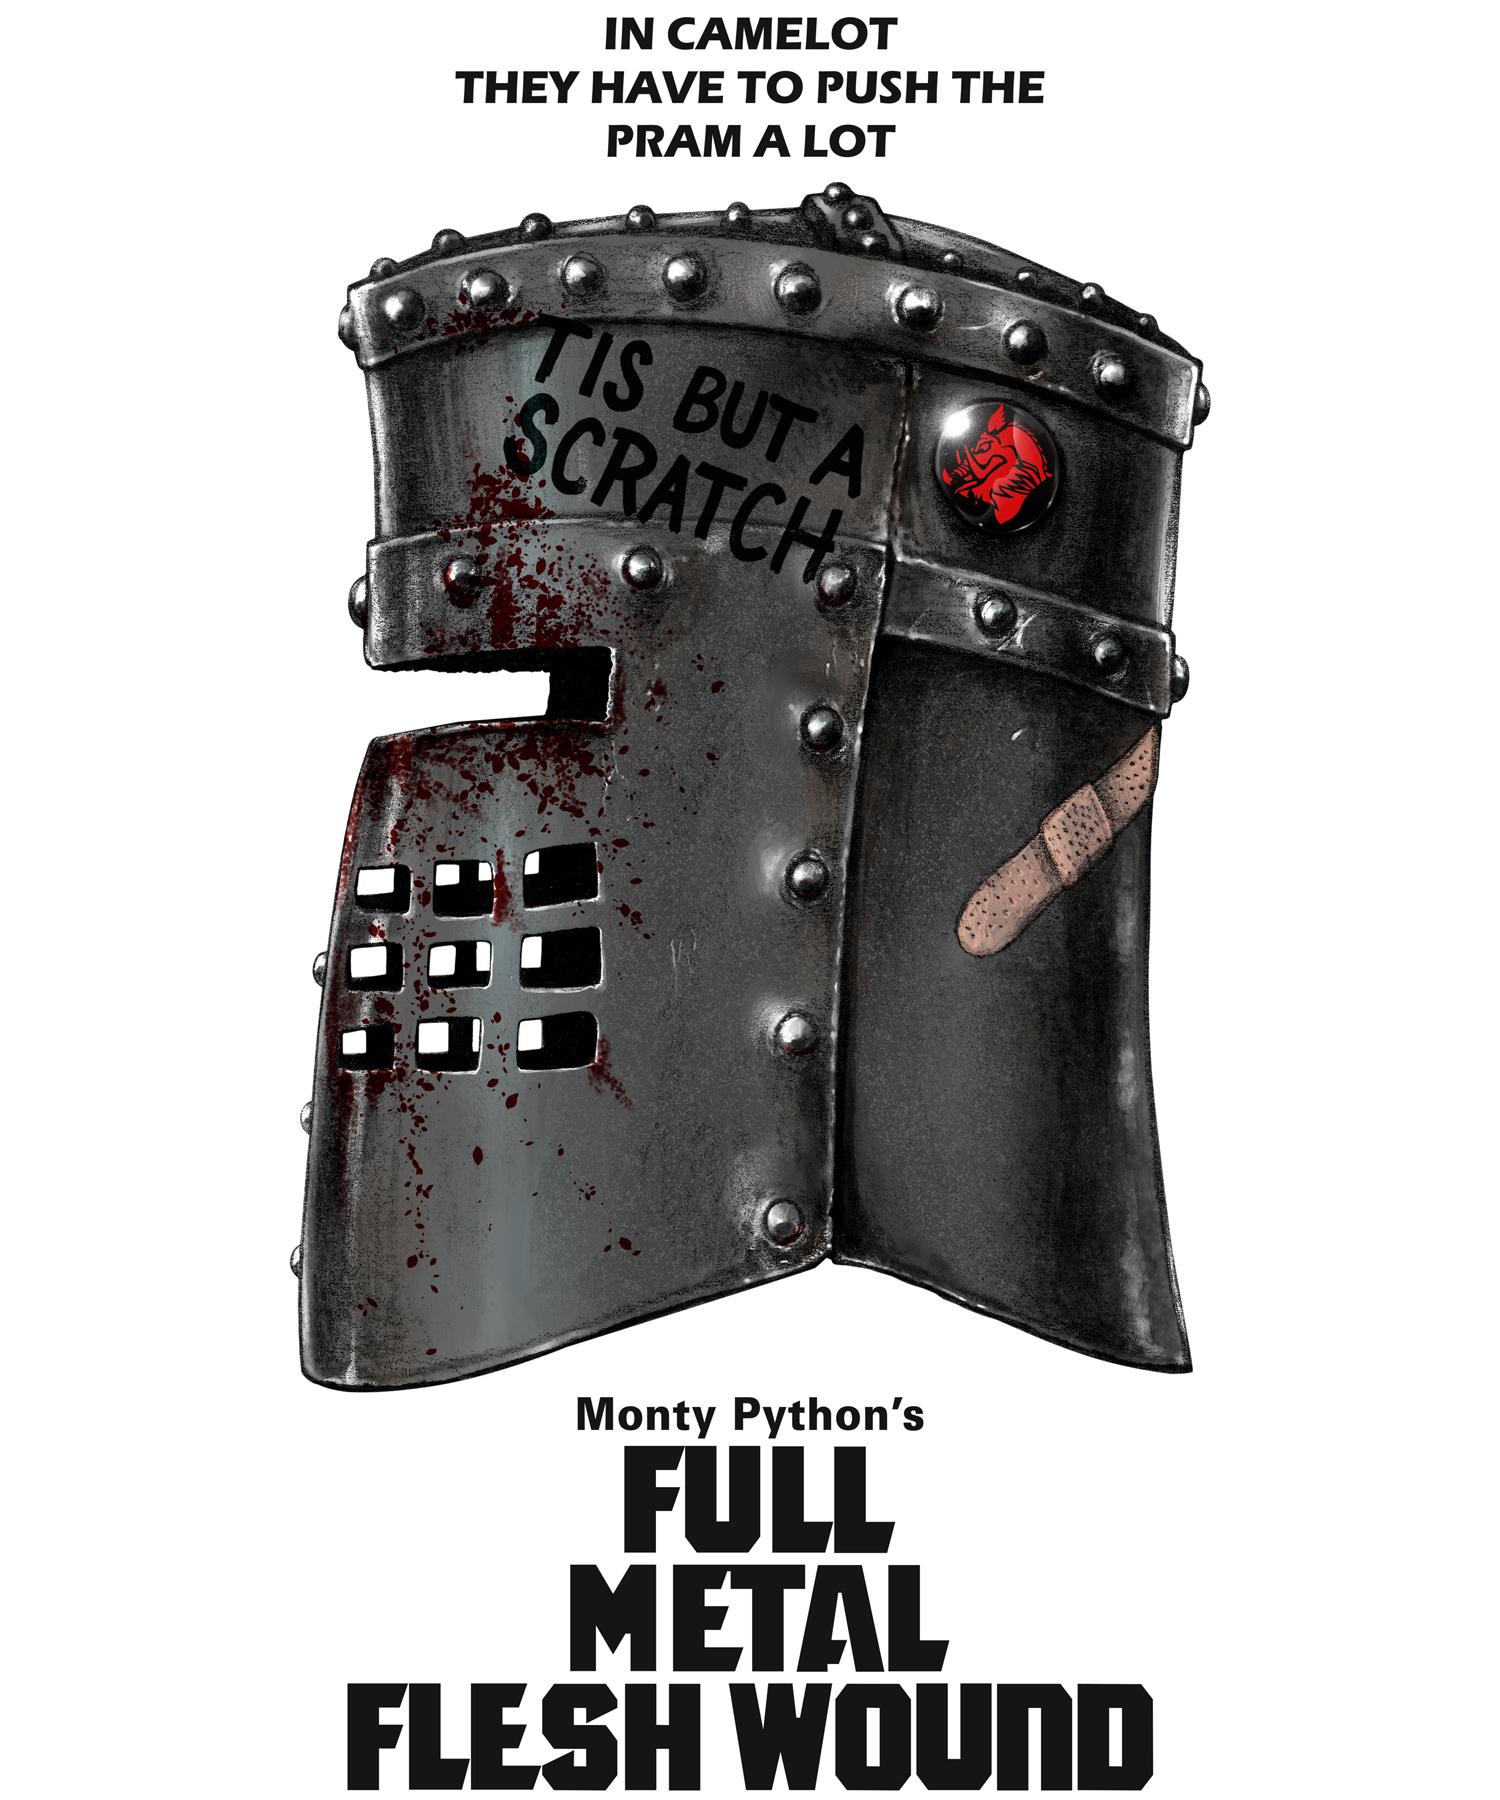 Full Metal Flesh Wound